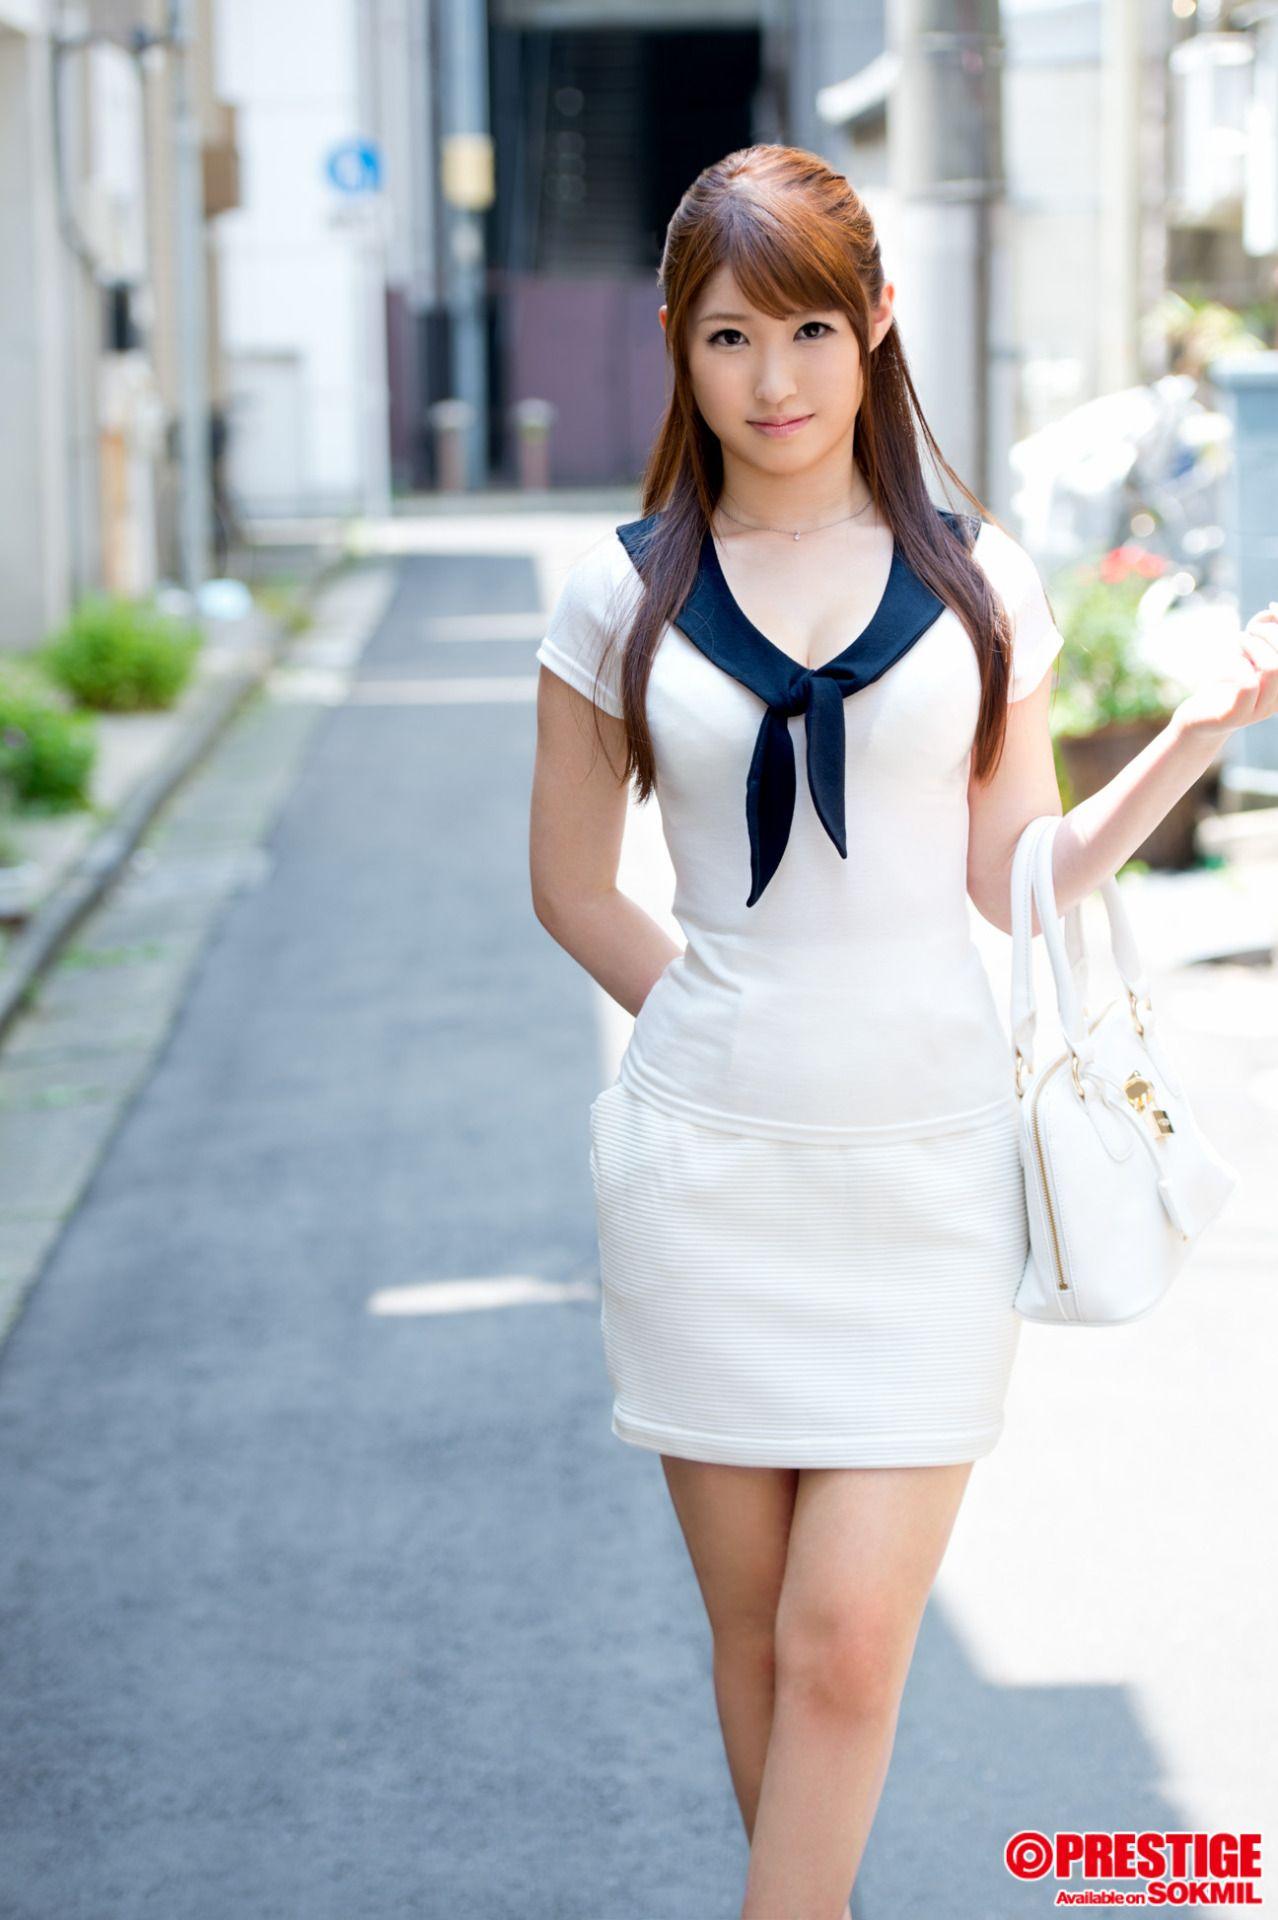 Asian babes escort arendal